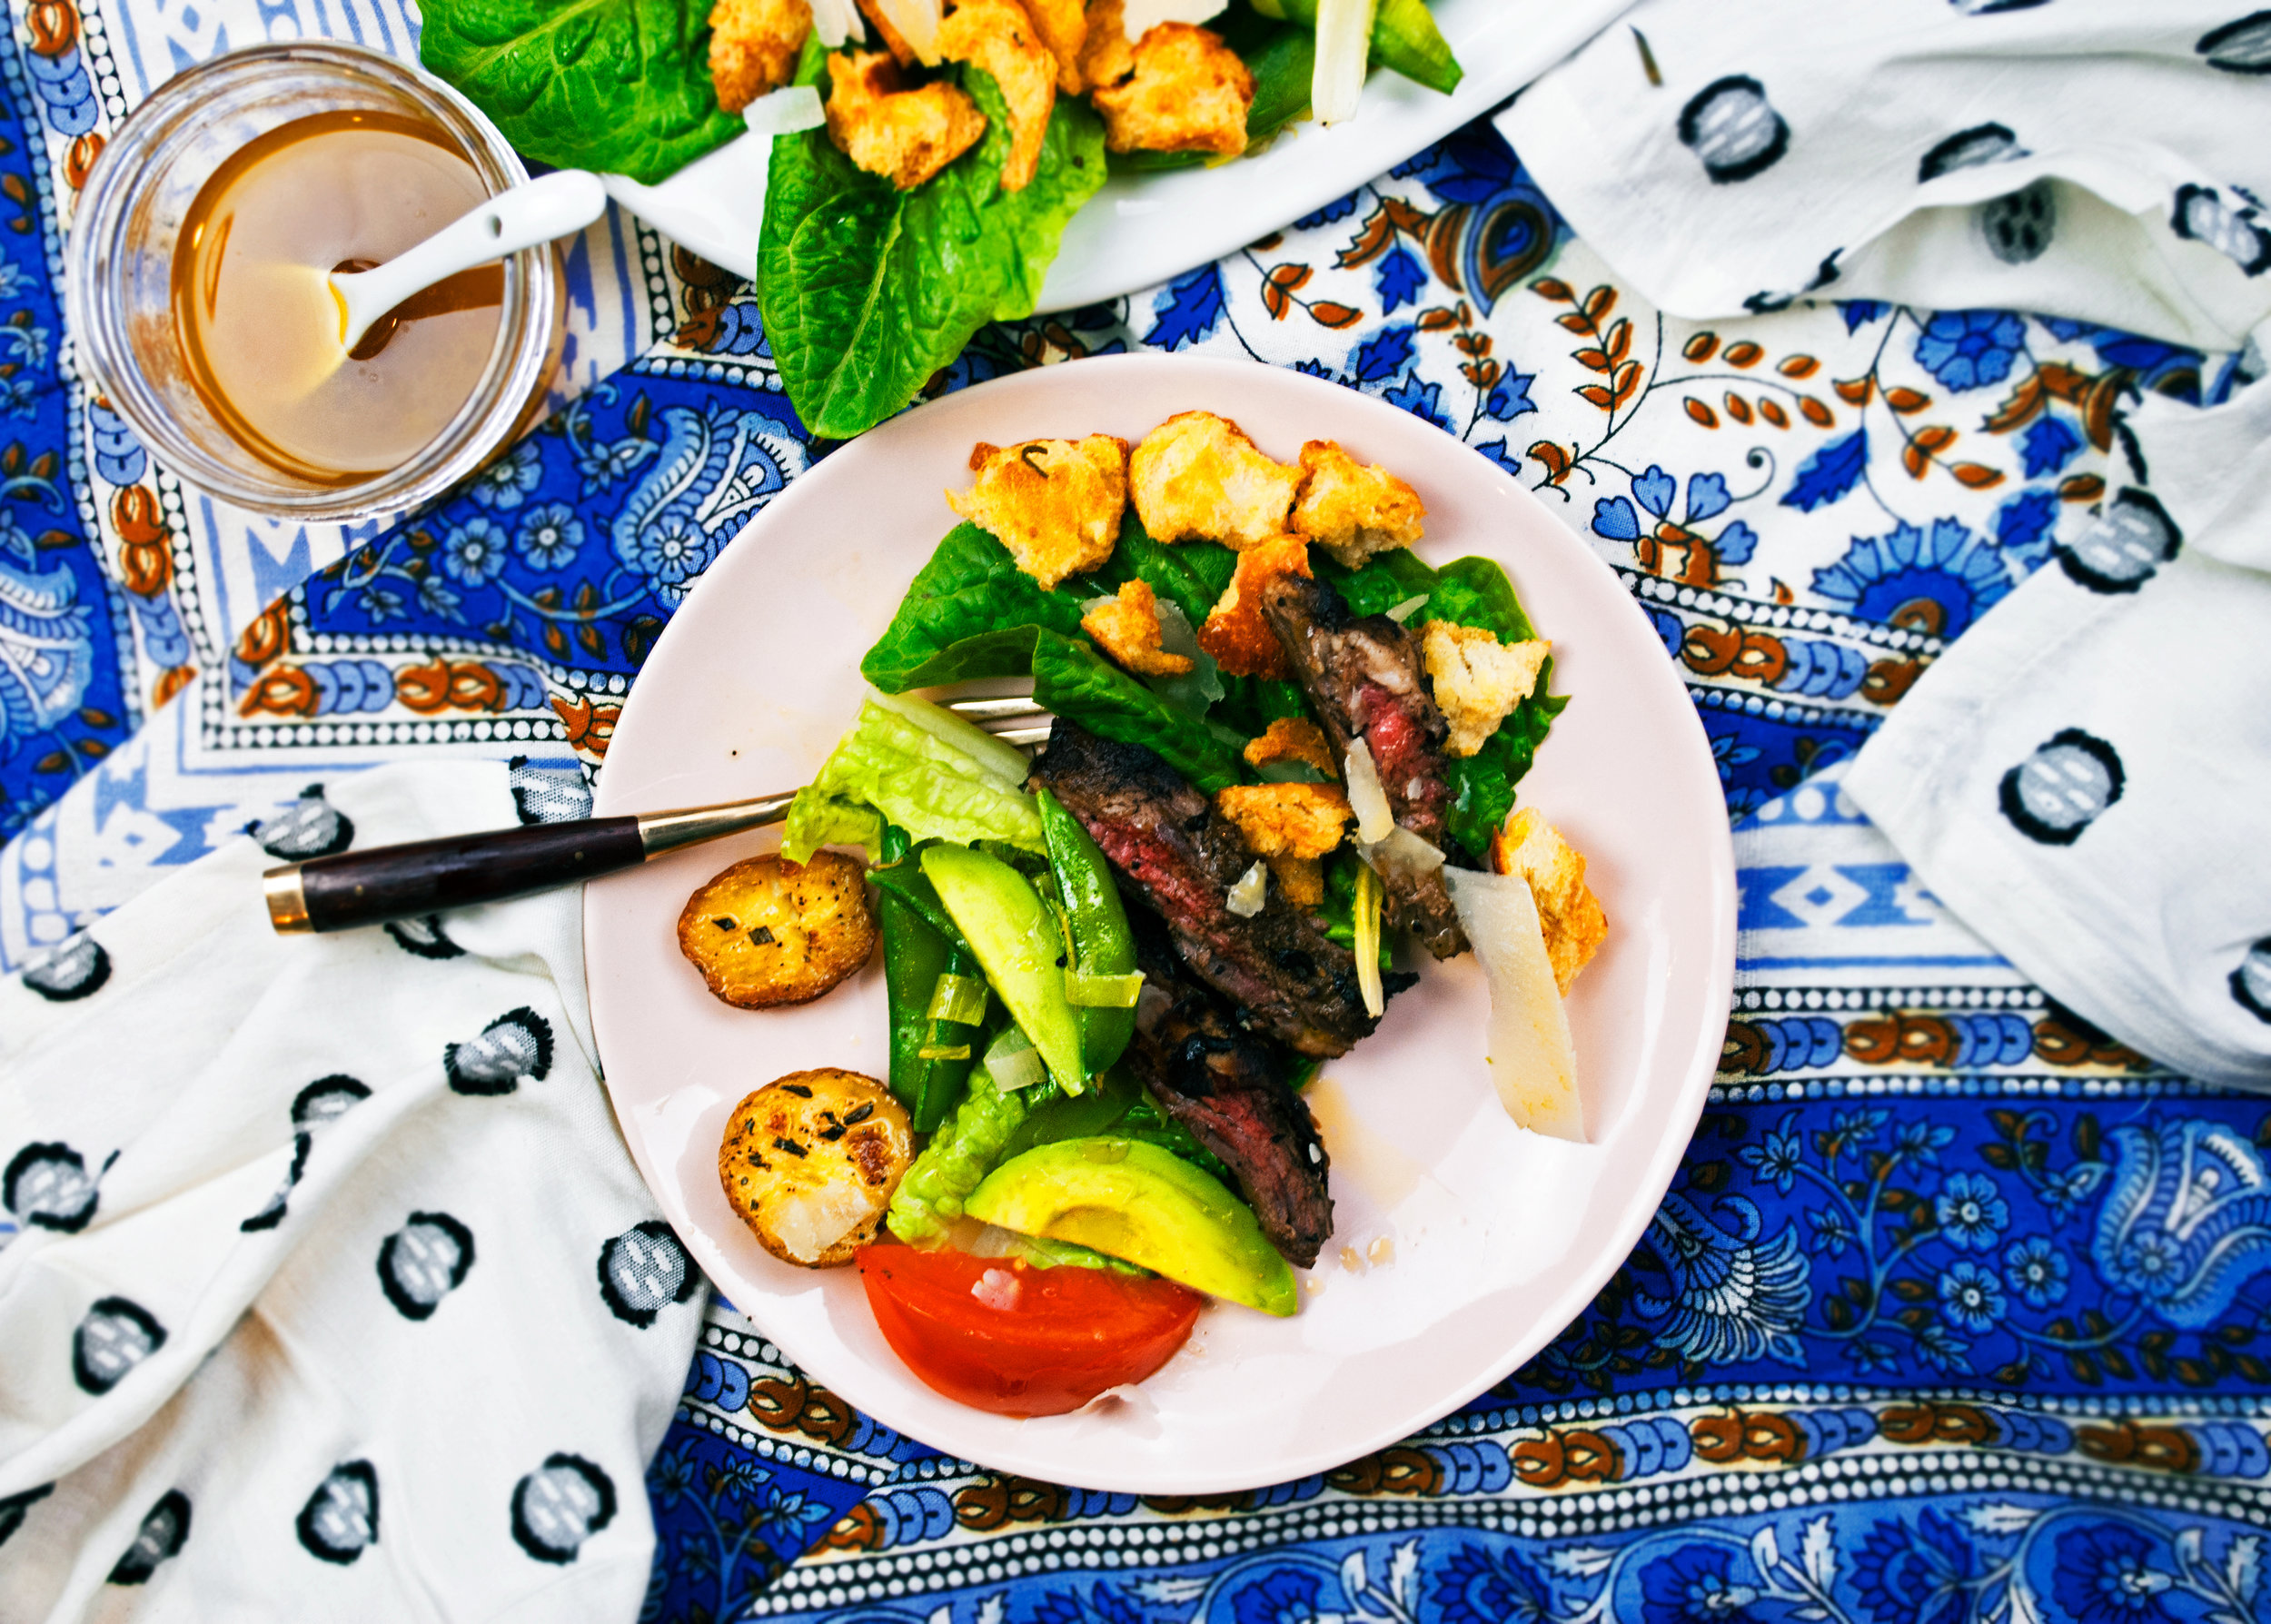 steak salad 3 high res.jpg